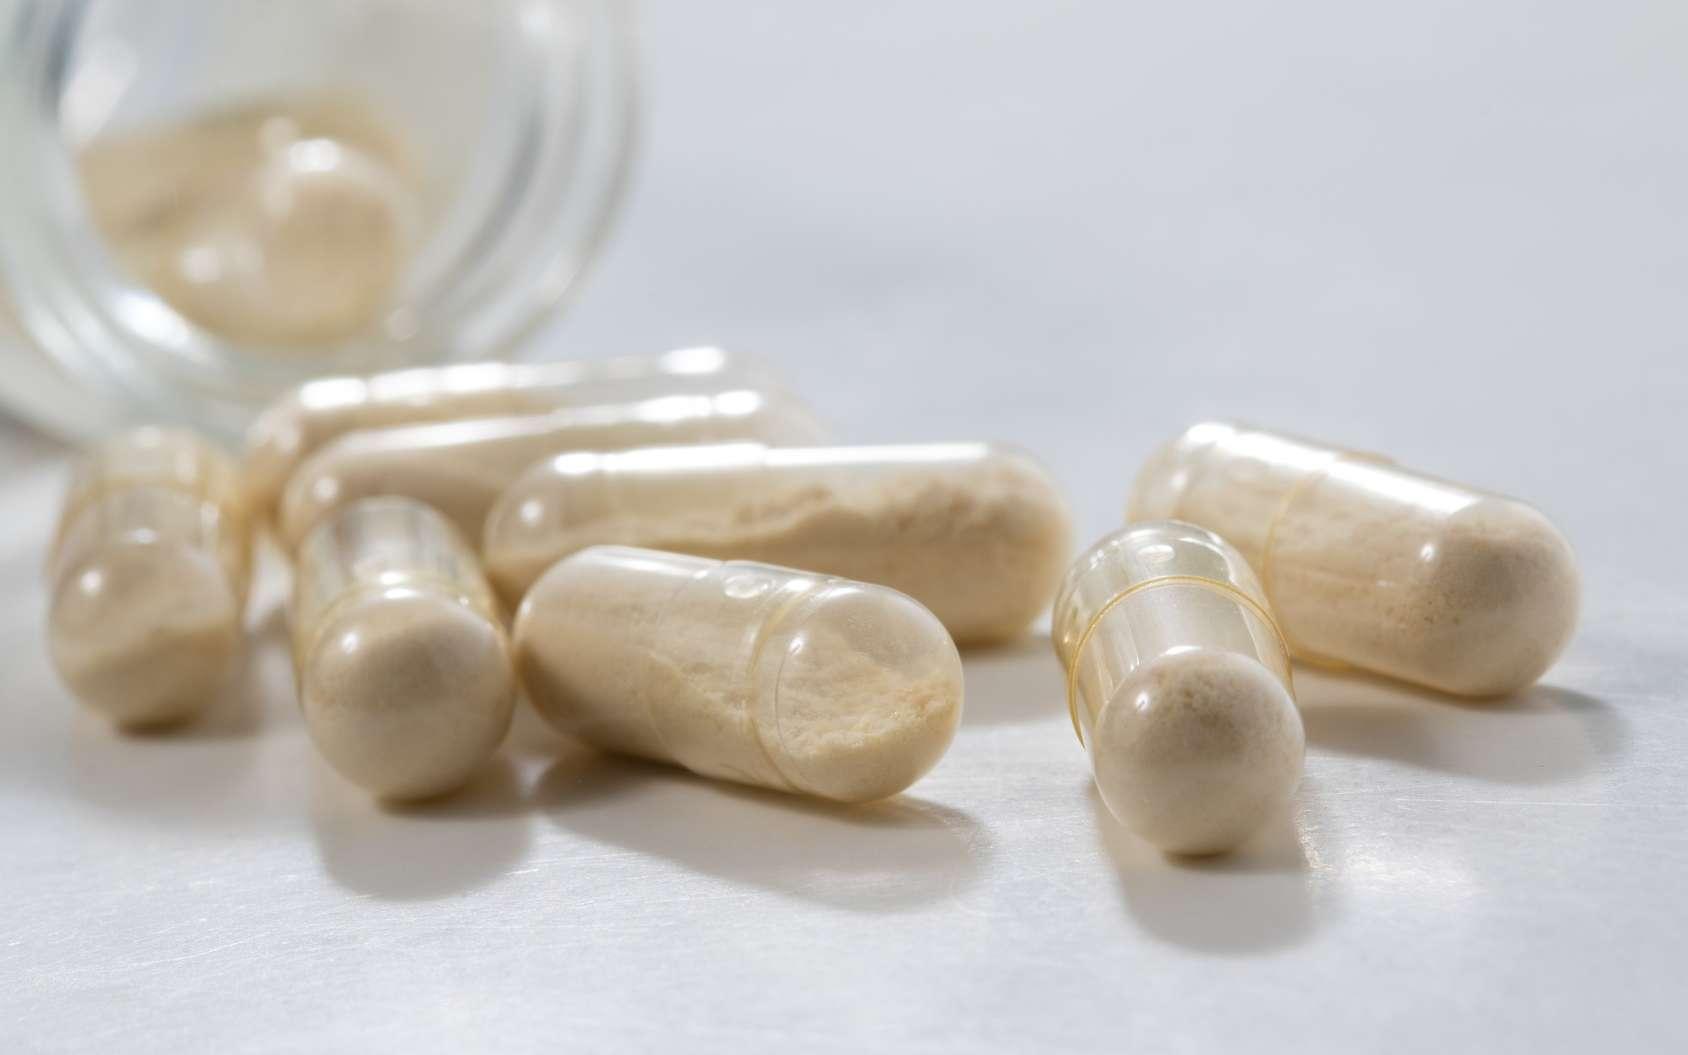 Les probiotiques peuvent-ils vraiment s'installer dans l'intestin ? © Geza Farkas, Fotolia